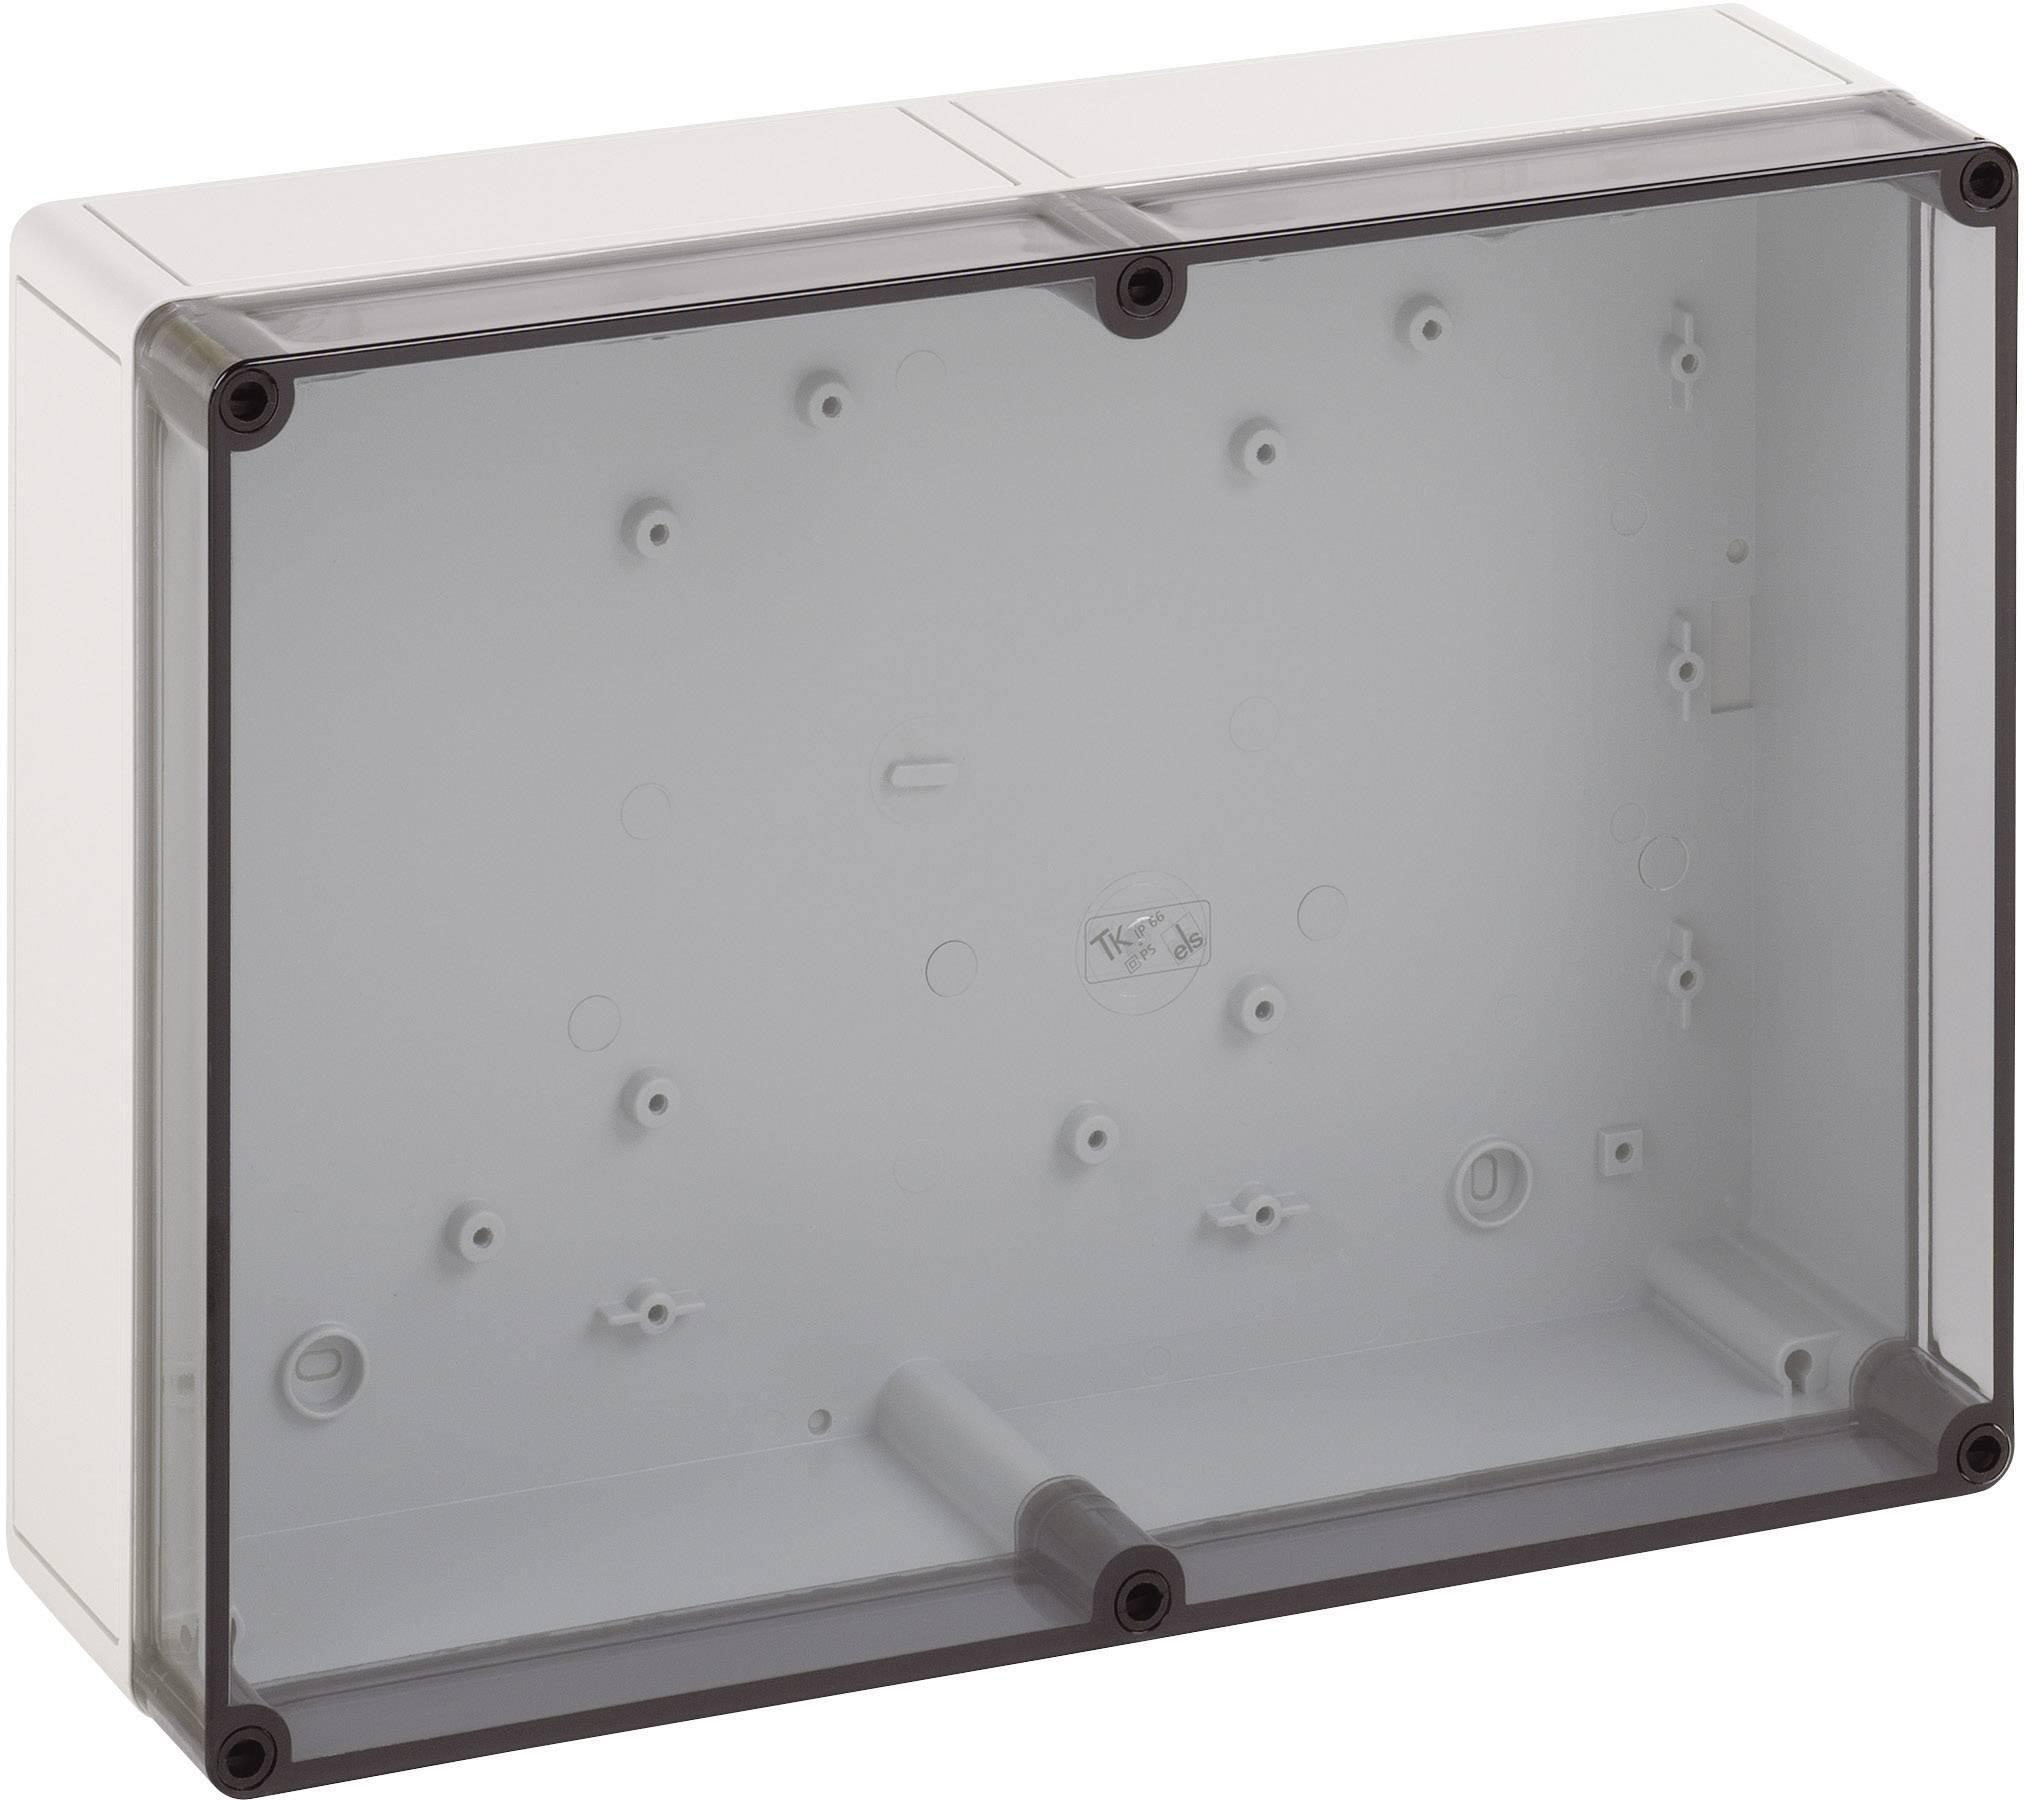 Inštalačná krabička Spelsberg TK PS 1309-6-t 11100901, (d x š x v) 130 x 94 x 57 mm, polykarbonát, polystyrén, svetlo sivá (RAL 7035), 1 ks